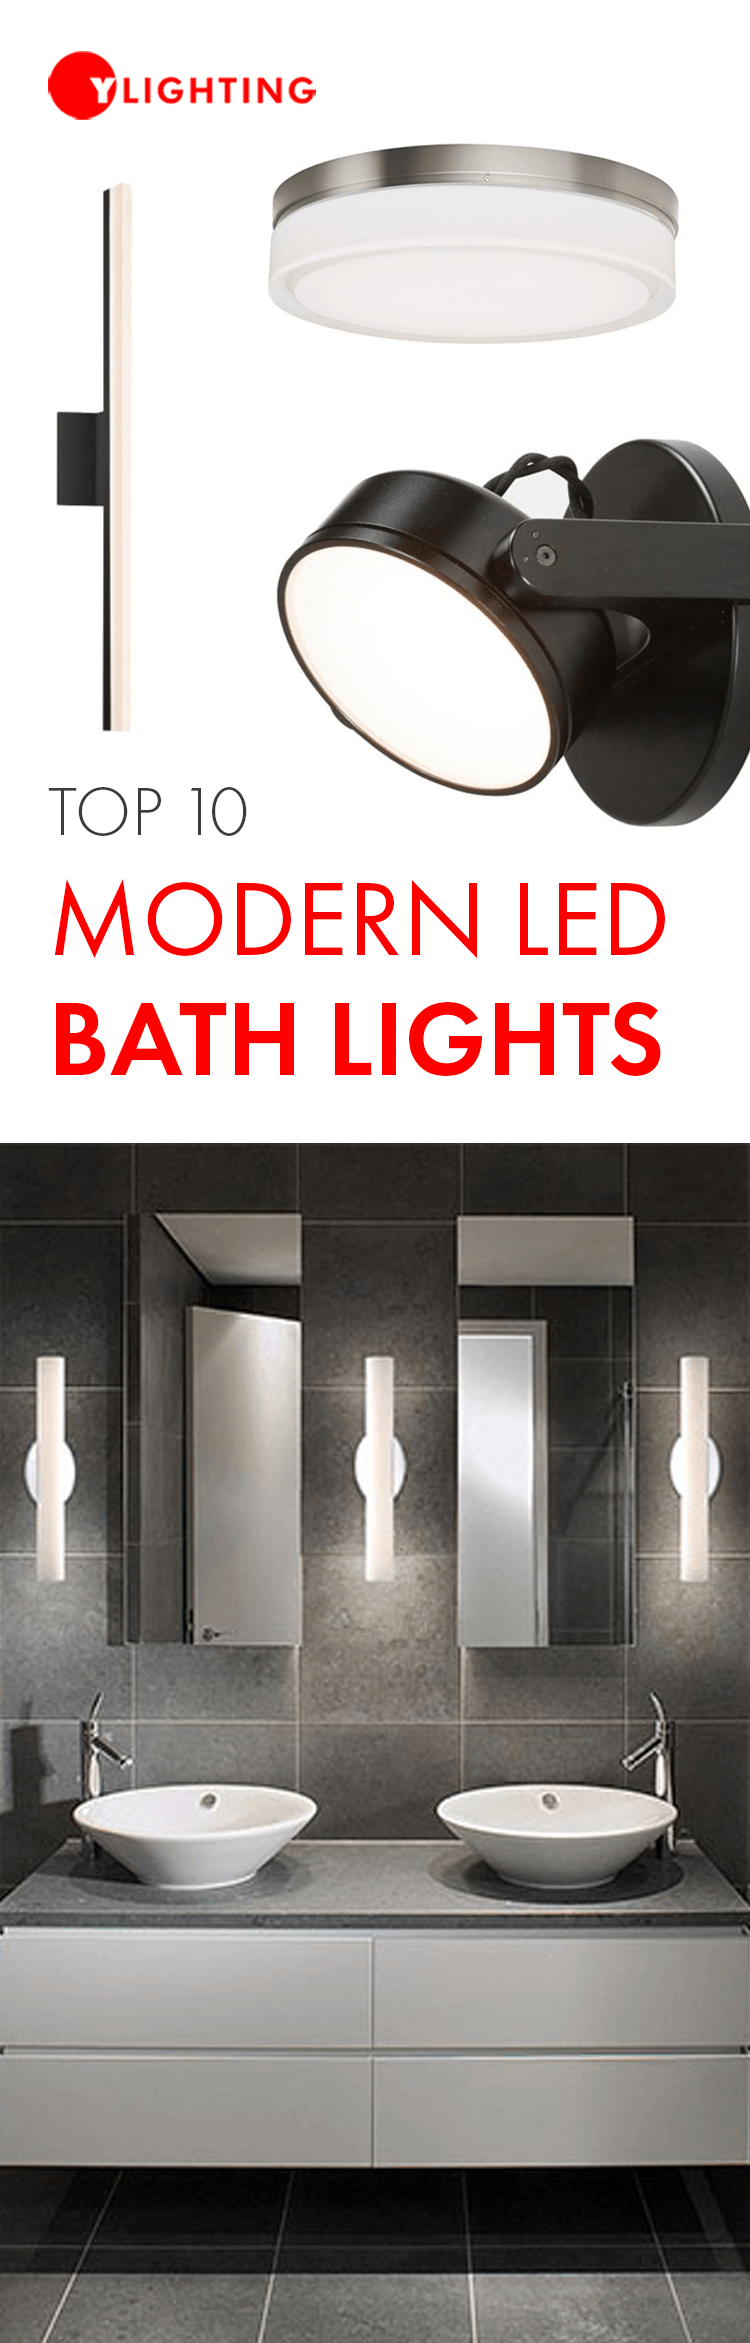 Top 10 Modern Led Bath Lights Bathroom Lighting Design Modern Bathroom Lighting Bathroom Lighting